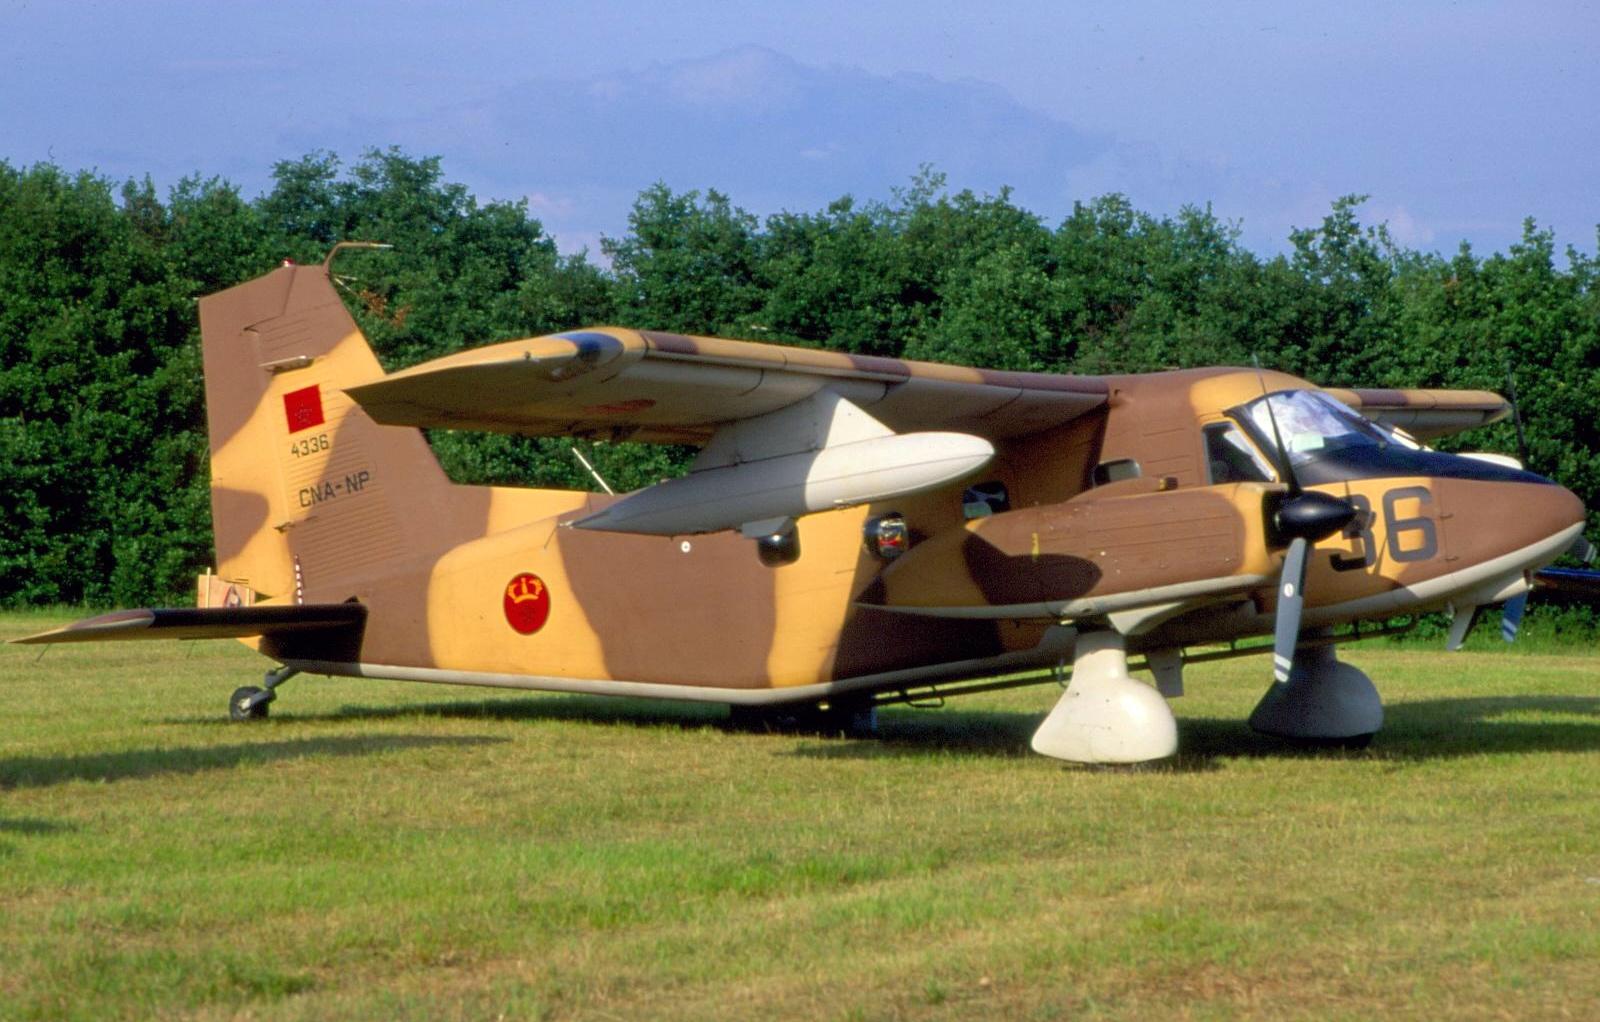 FRA: Photos anciens avions des FRA - Page 7 150607054000327838